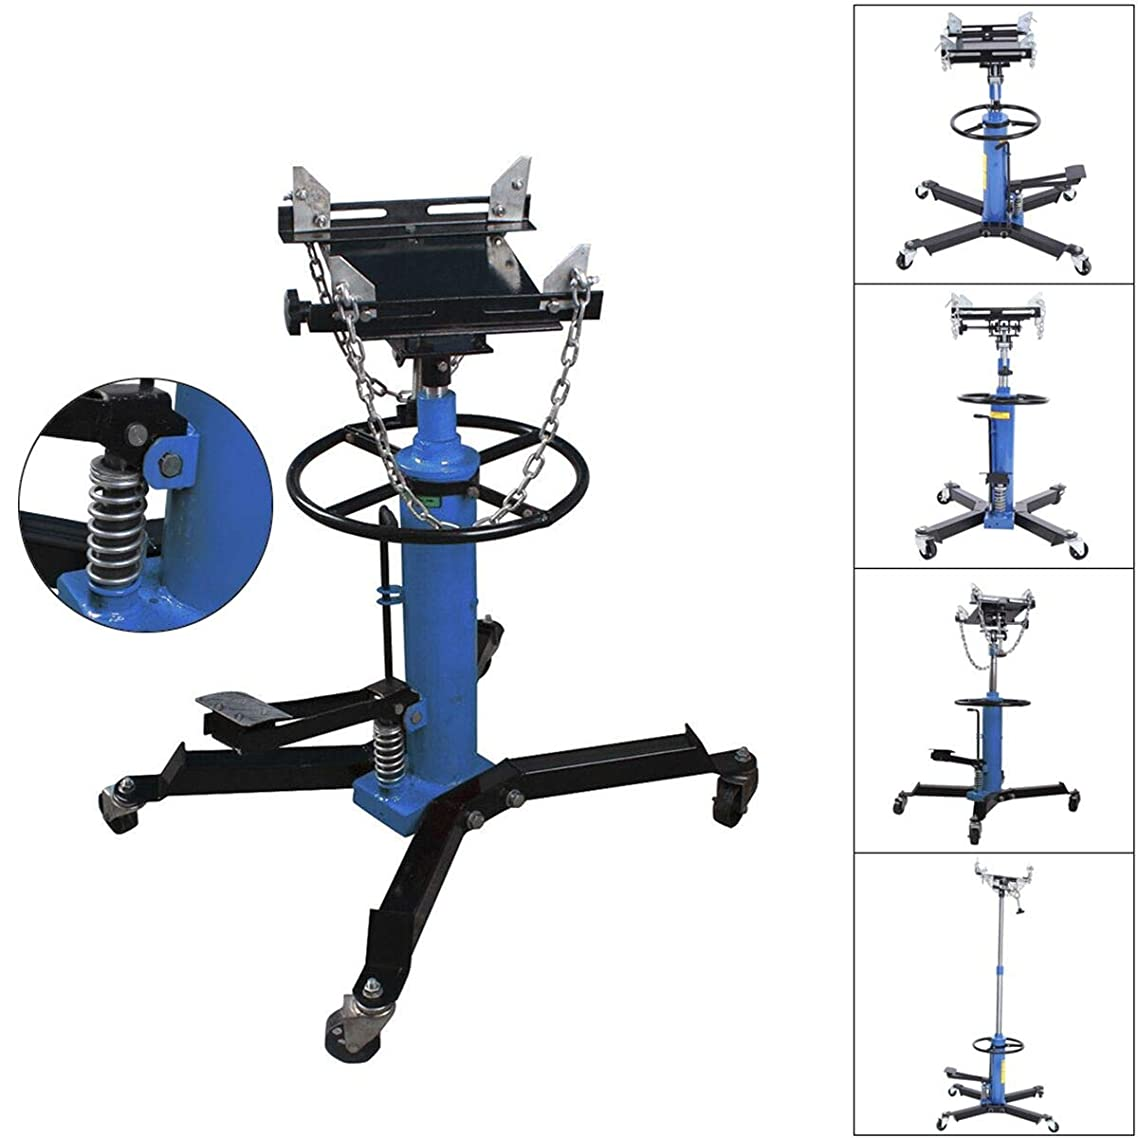 SuxiDi 2 Stage1100LBS Hydraulic Transmission Jack w/ 360° Swivel Wheels Lift Hoist Blue